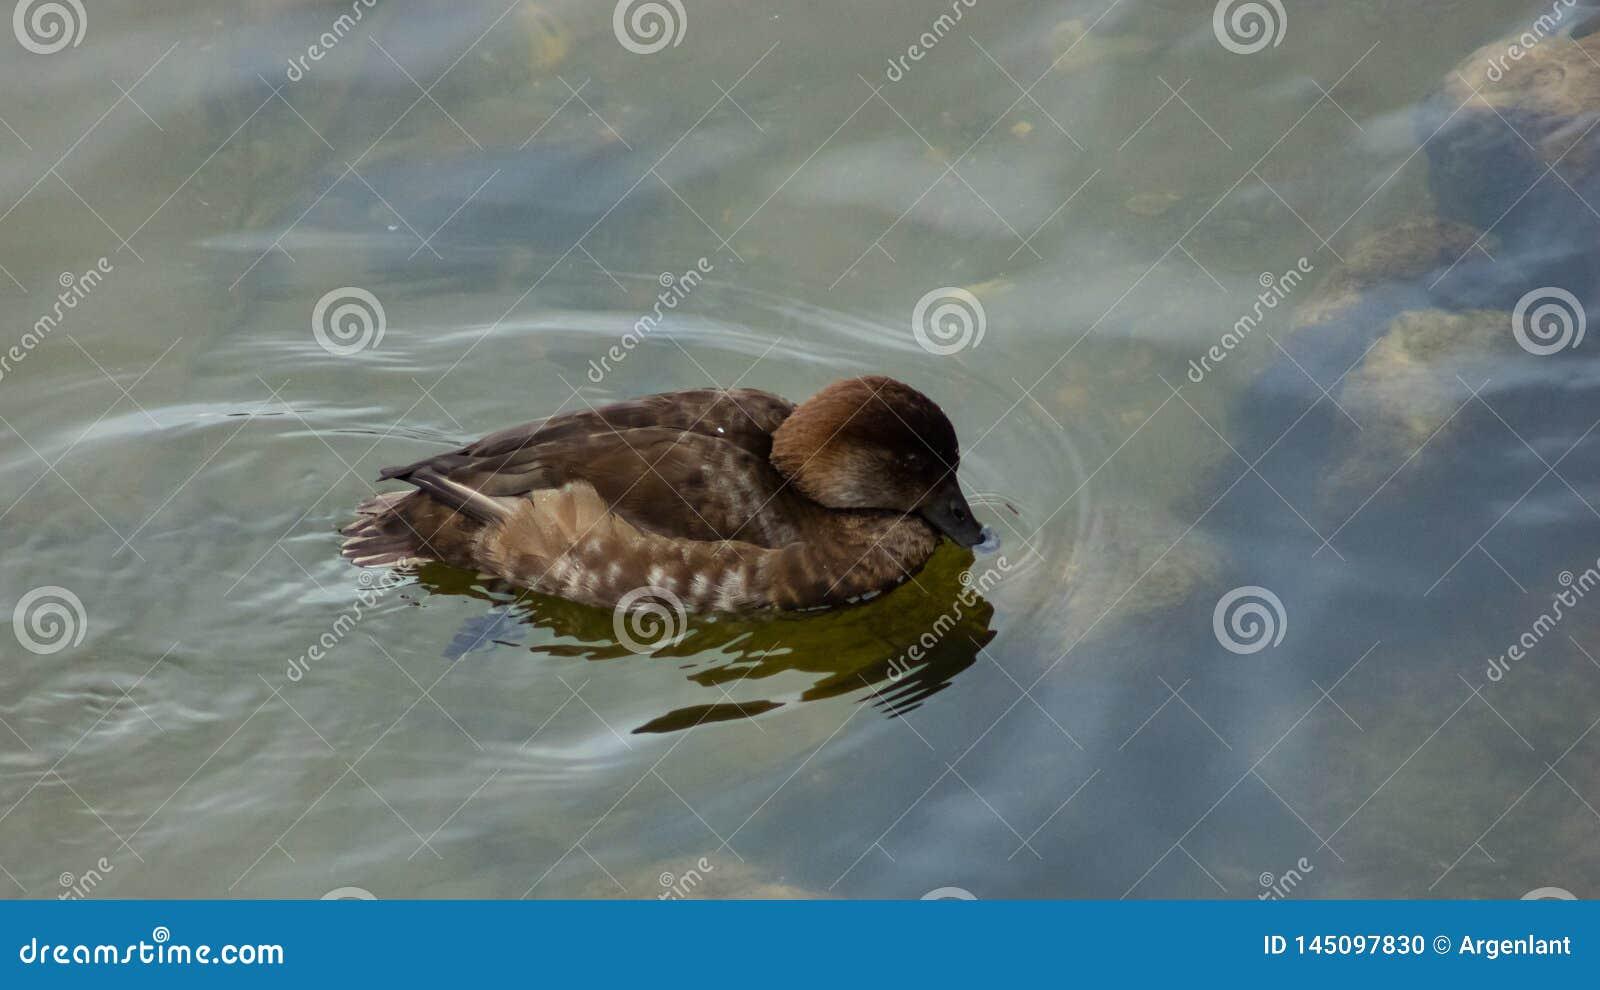 Kvinnlig av f?r pochard- eller Aythyaferinan?rbild f?r dyka and gemensam simning f?r st?ende i floden, selektiv fokus, grund DOF